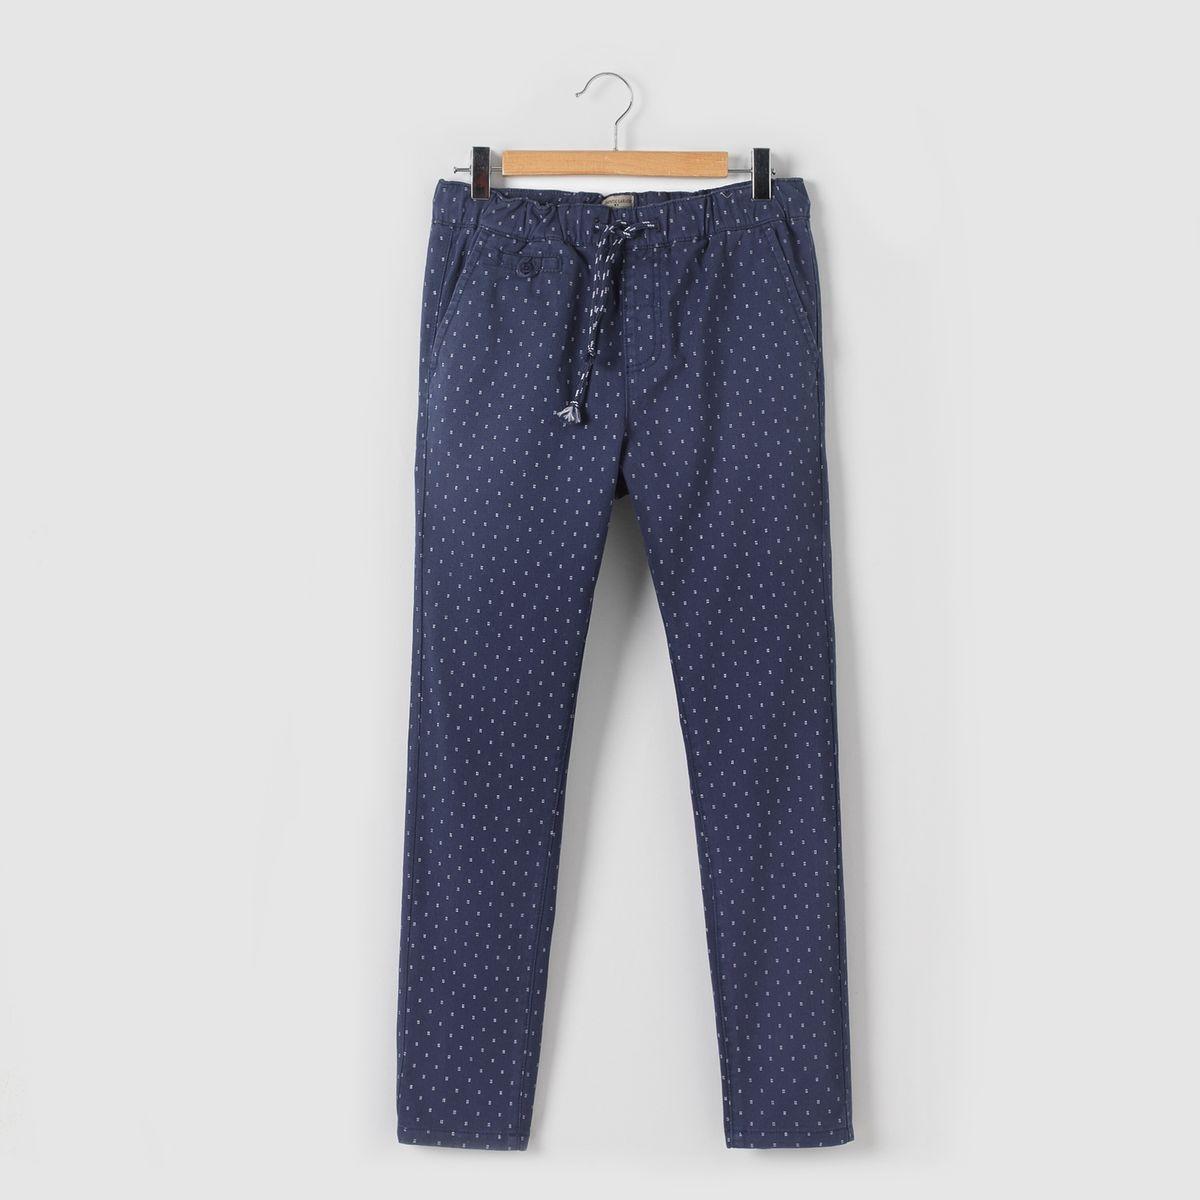 Pantalon imprimé micro-motifs 10-16 ans